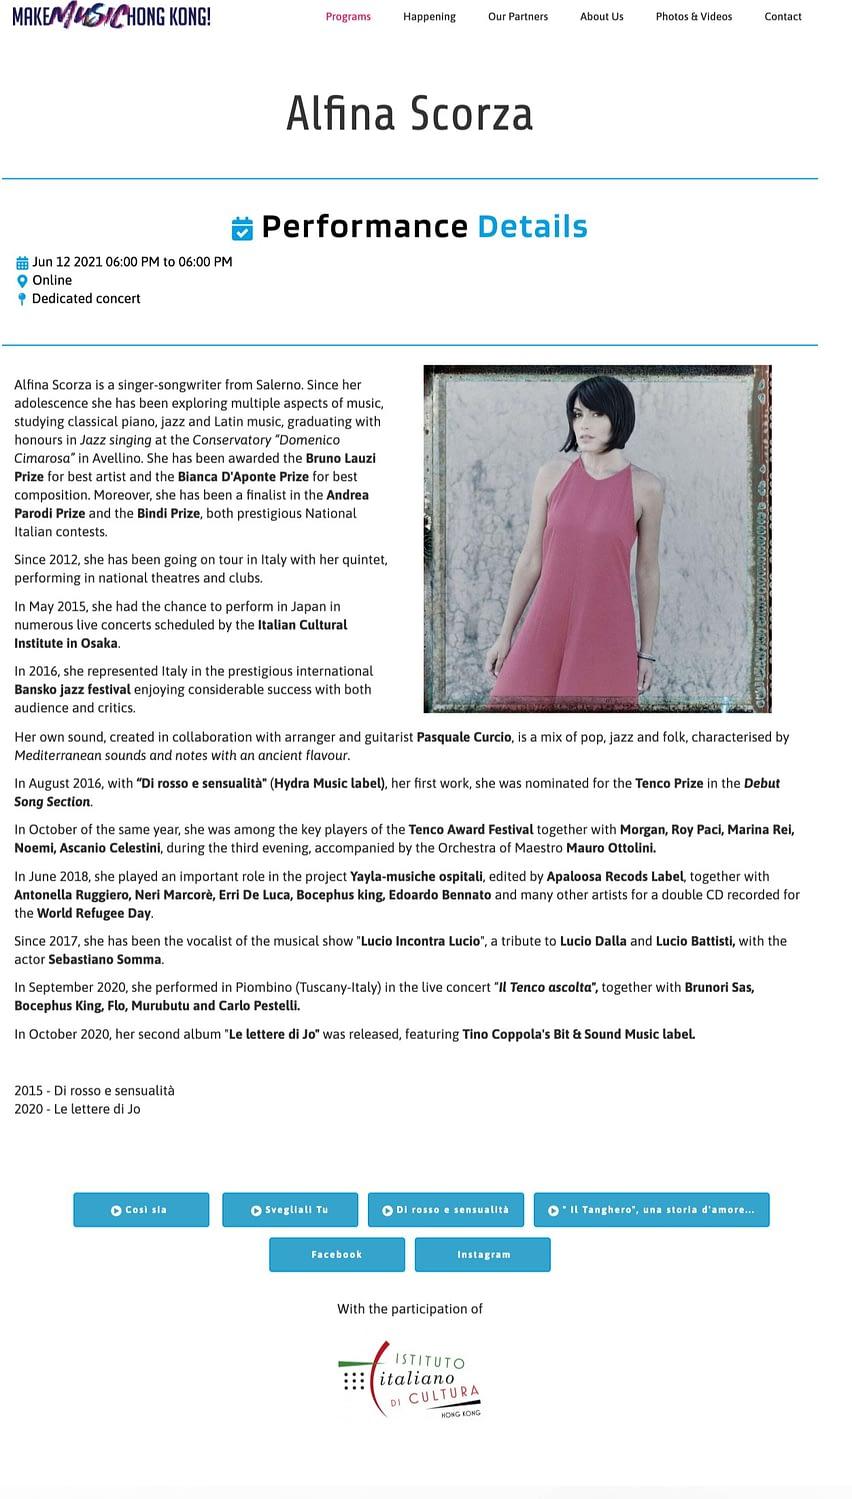 Make Music Hong Kong Alfina Scorza 1